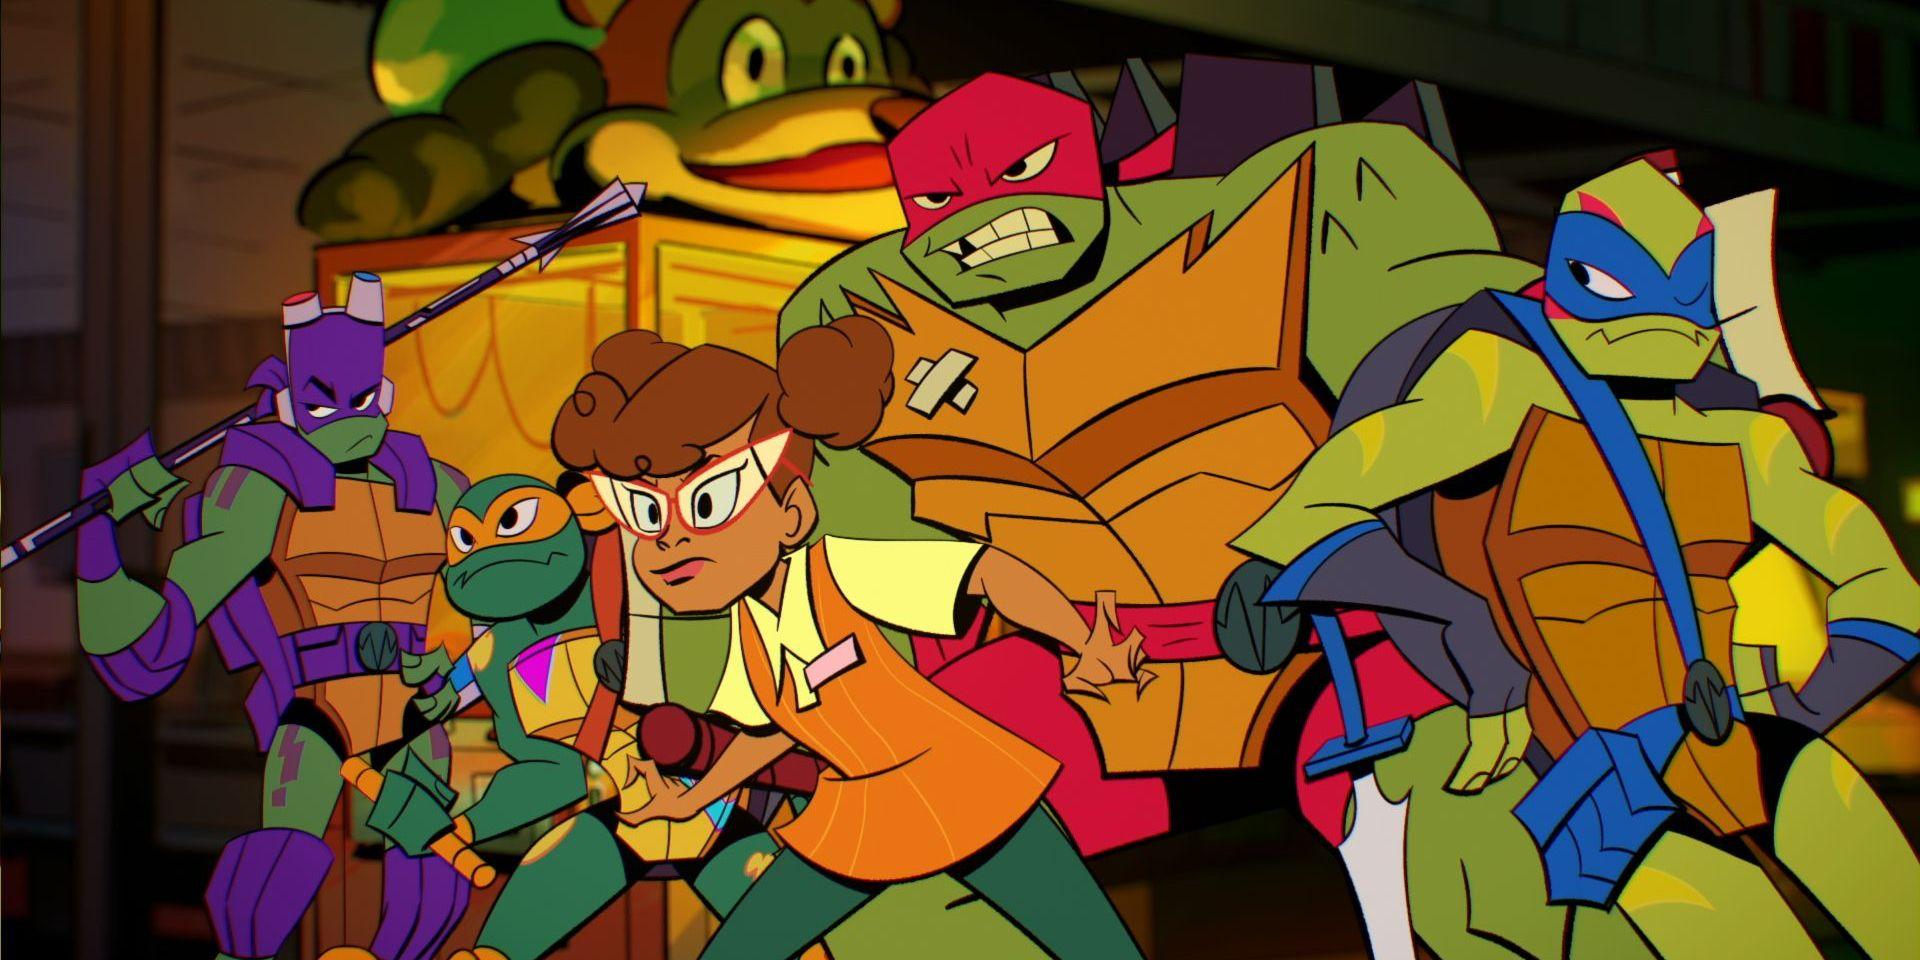 Rise of the Teenage Mutant Ninja Turtles Influenced by Batman '66